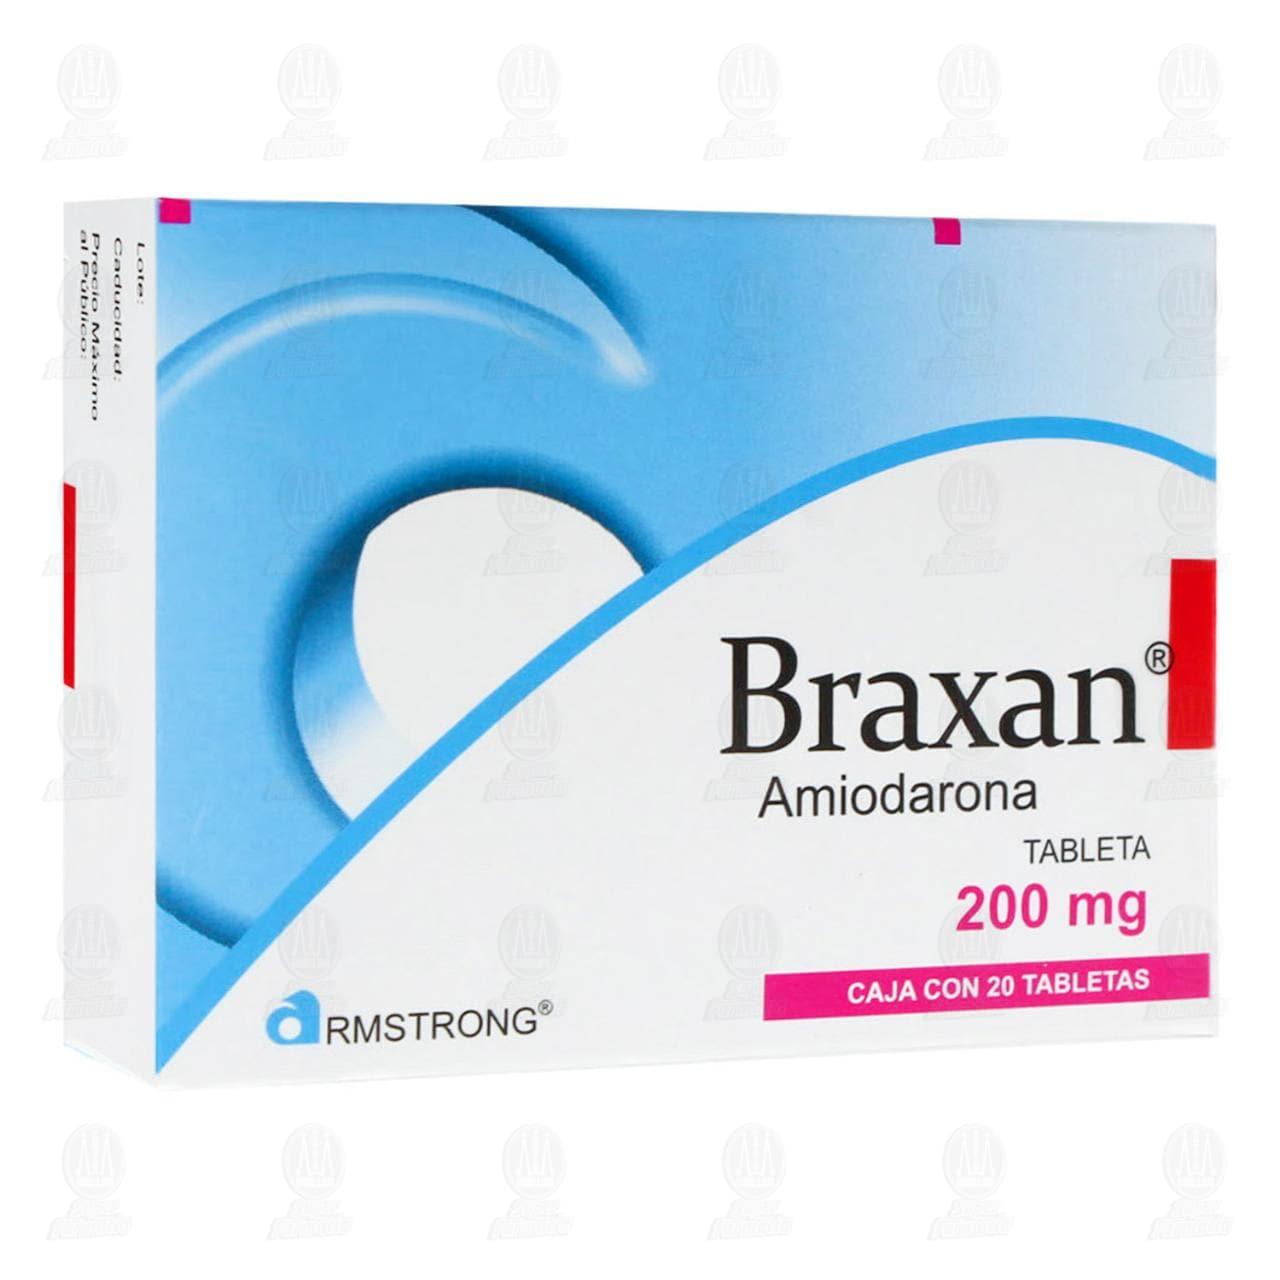 Comprar Braxan 200mg 20 Tabletas en Farmacias Guadalajara